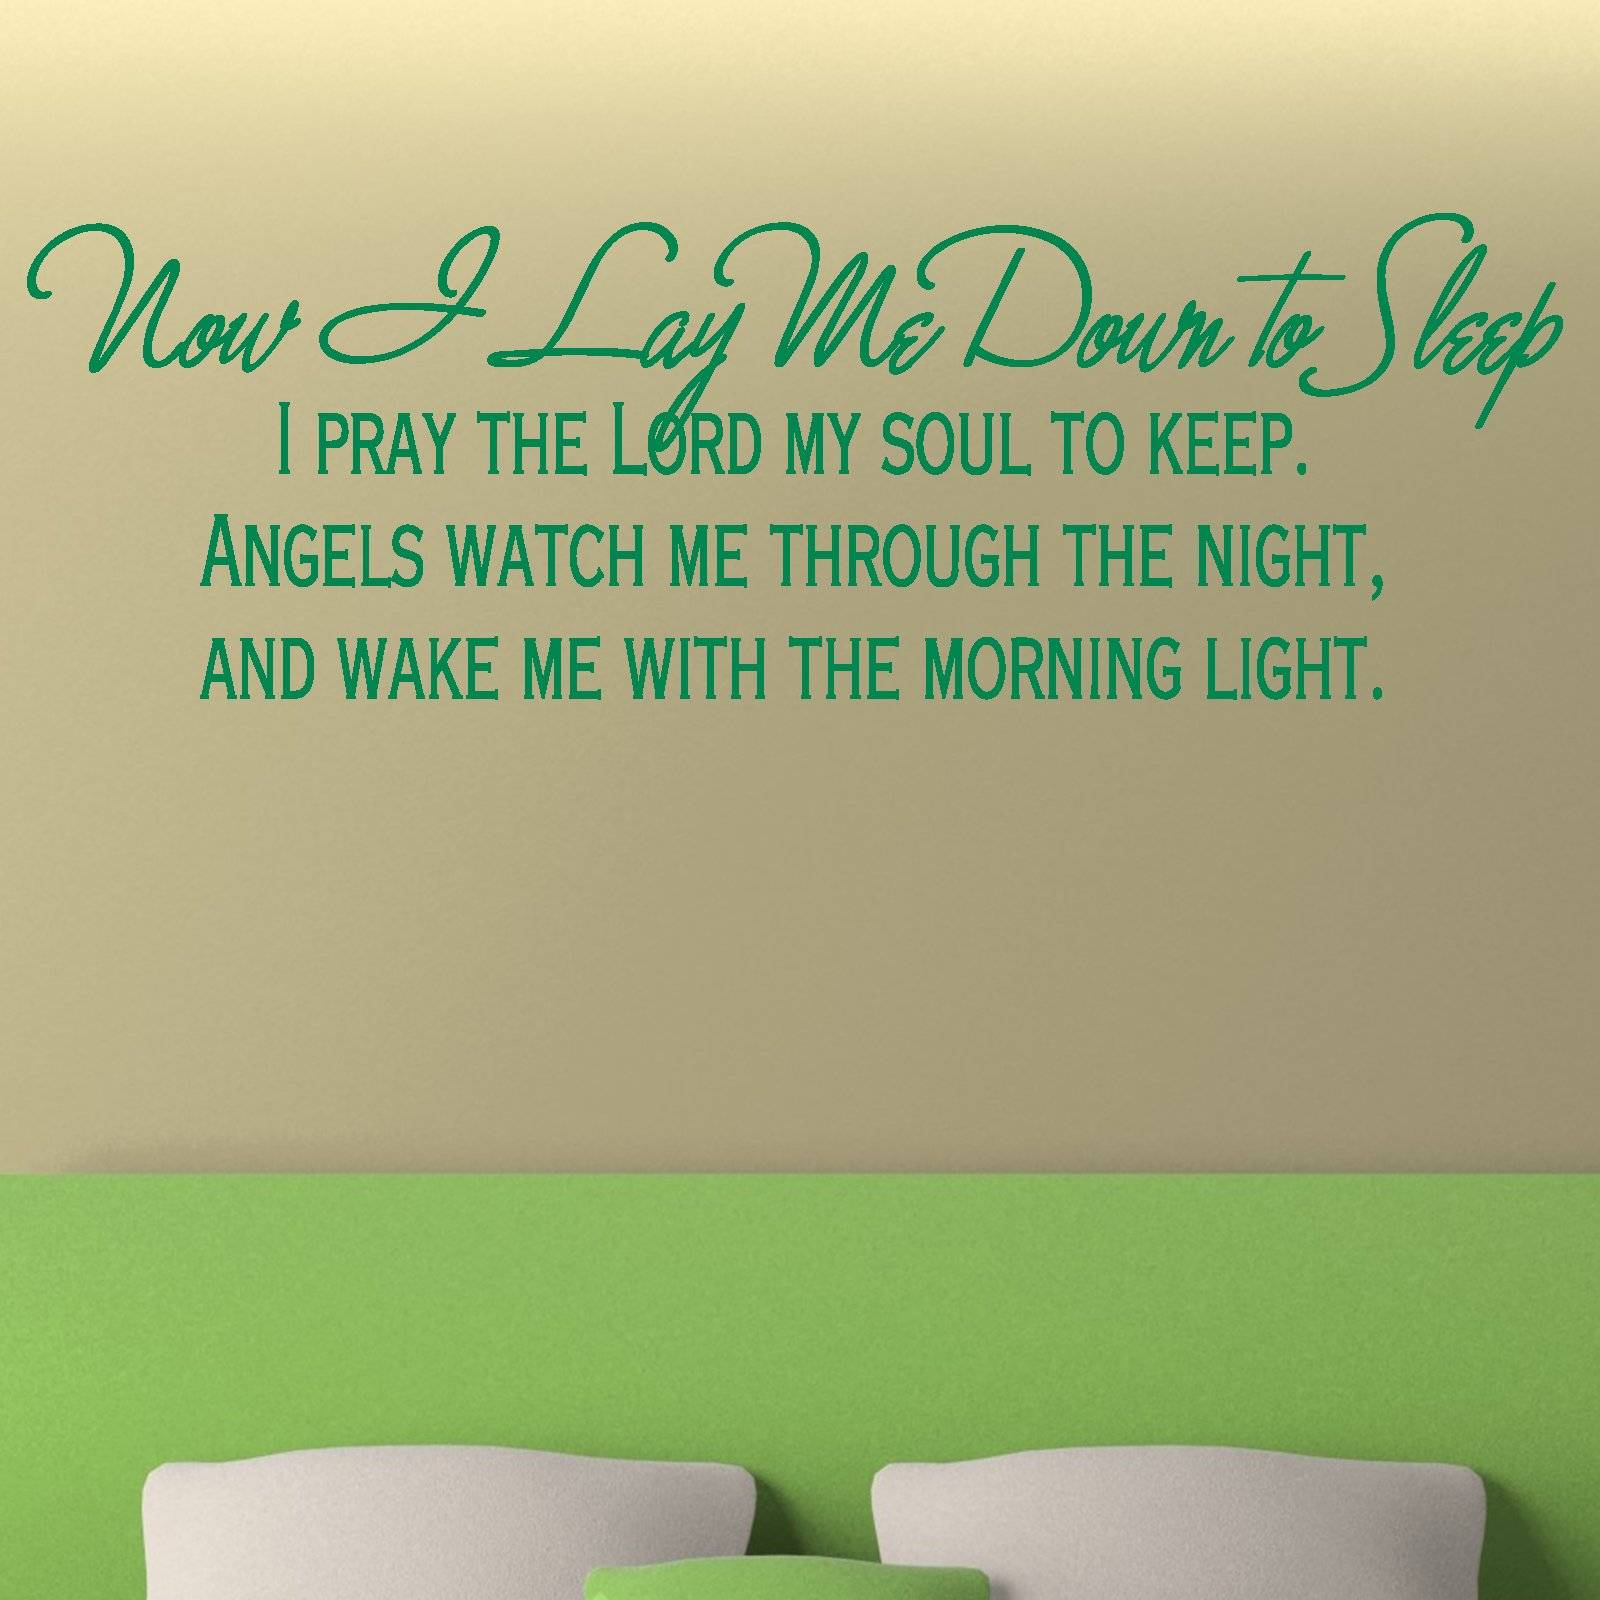 Now i lay me down to sleep wall decal - Now I Lay Me Down To Sleep Religious Quote Wall Sticker Decal B